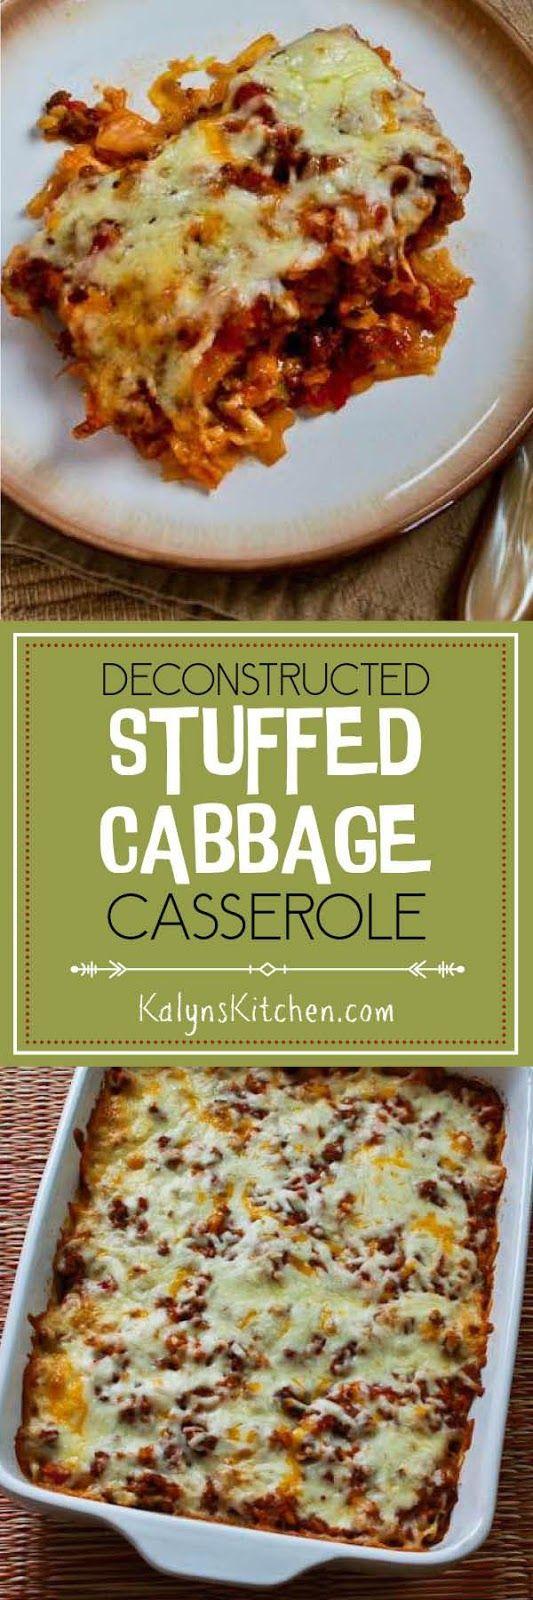 Stuffed Cabbage Casserole | Stuffed Cabbage Casserole, Cabbage ...